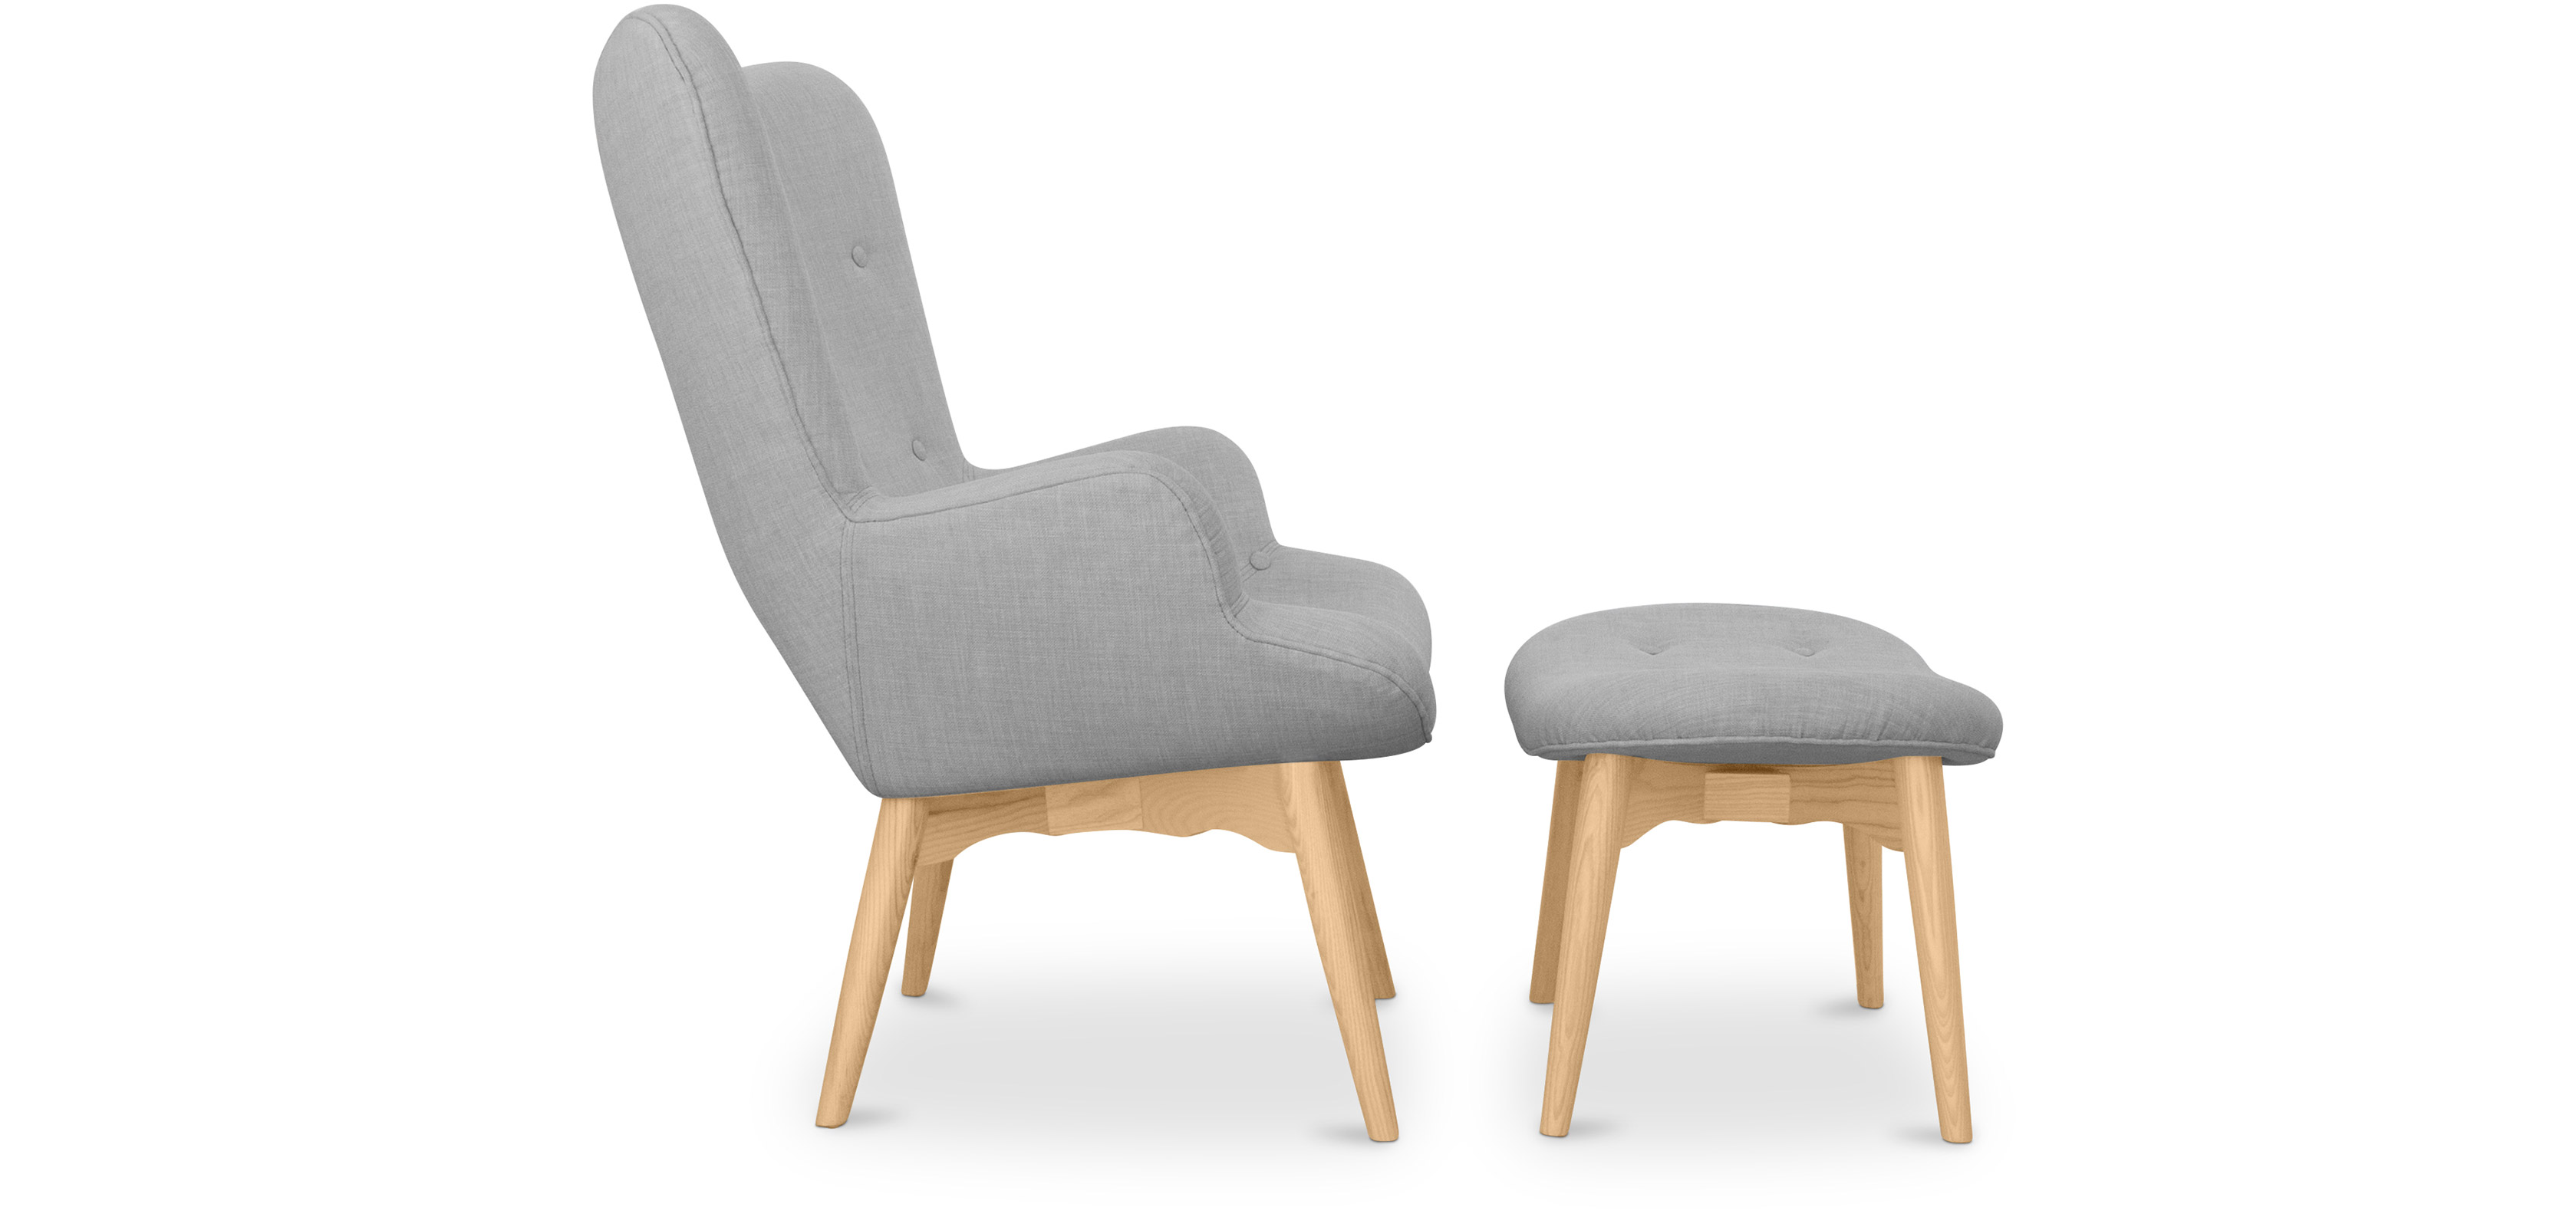 grant featherston fauteuil fauteuil bascule design. Black Bedroom Furniture Sets. Home Design Ideas